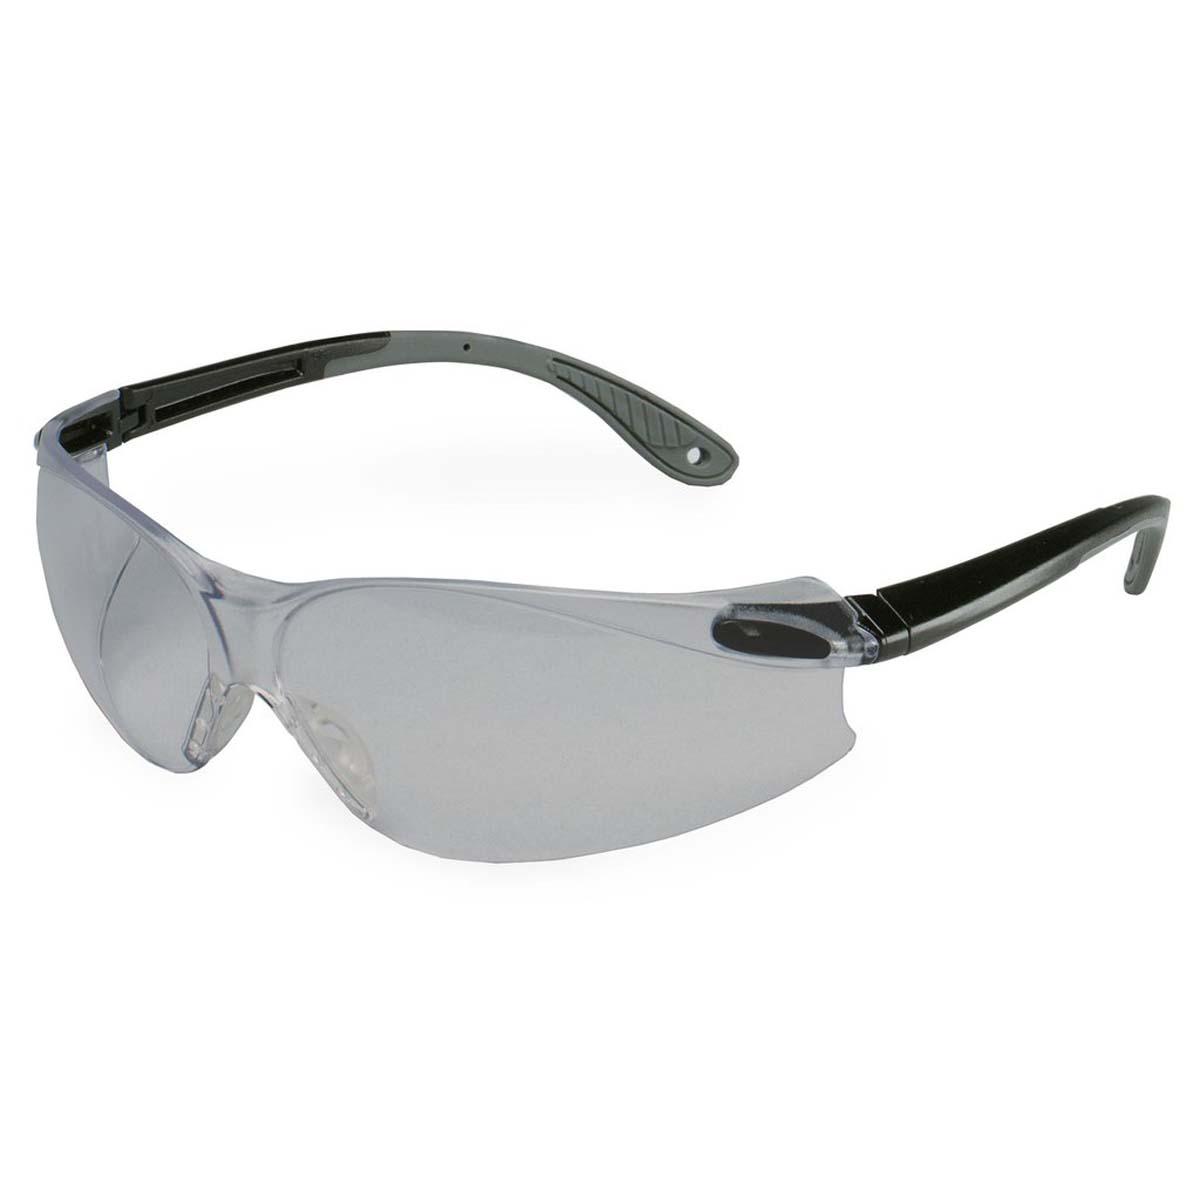 "3Mâ""¢ Virtuaâ""¢ V4 Protective Eyewear 11671-00000-20 Gray HC Lens, Black/Gray Temple"